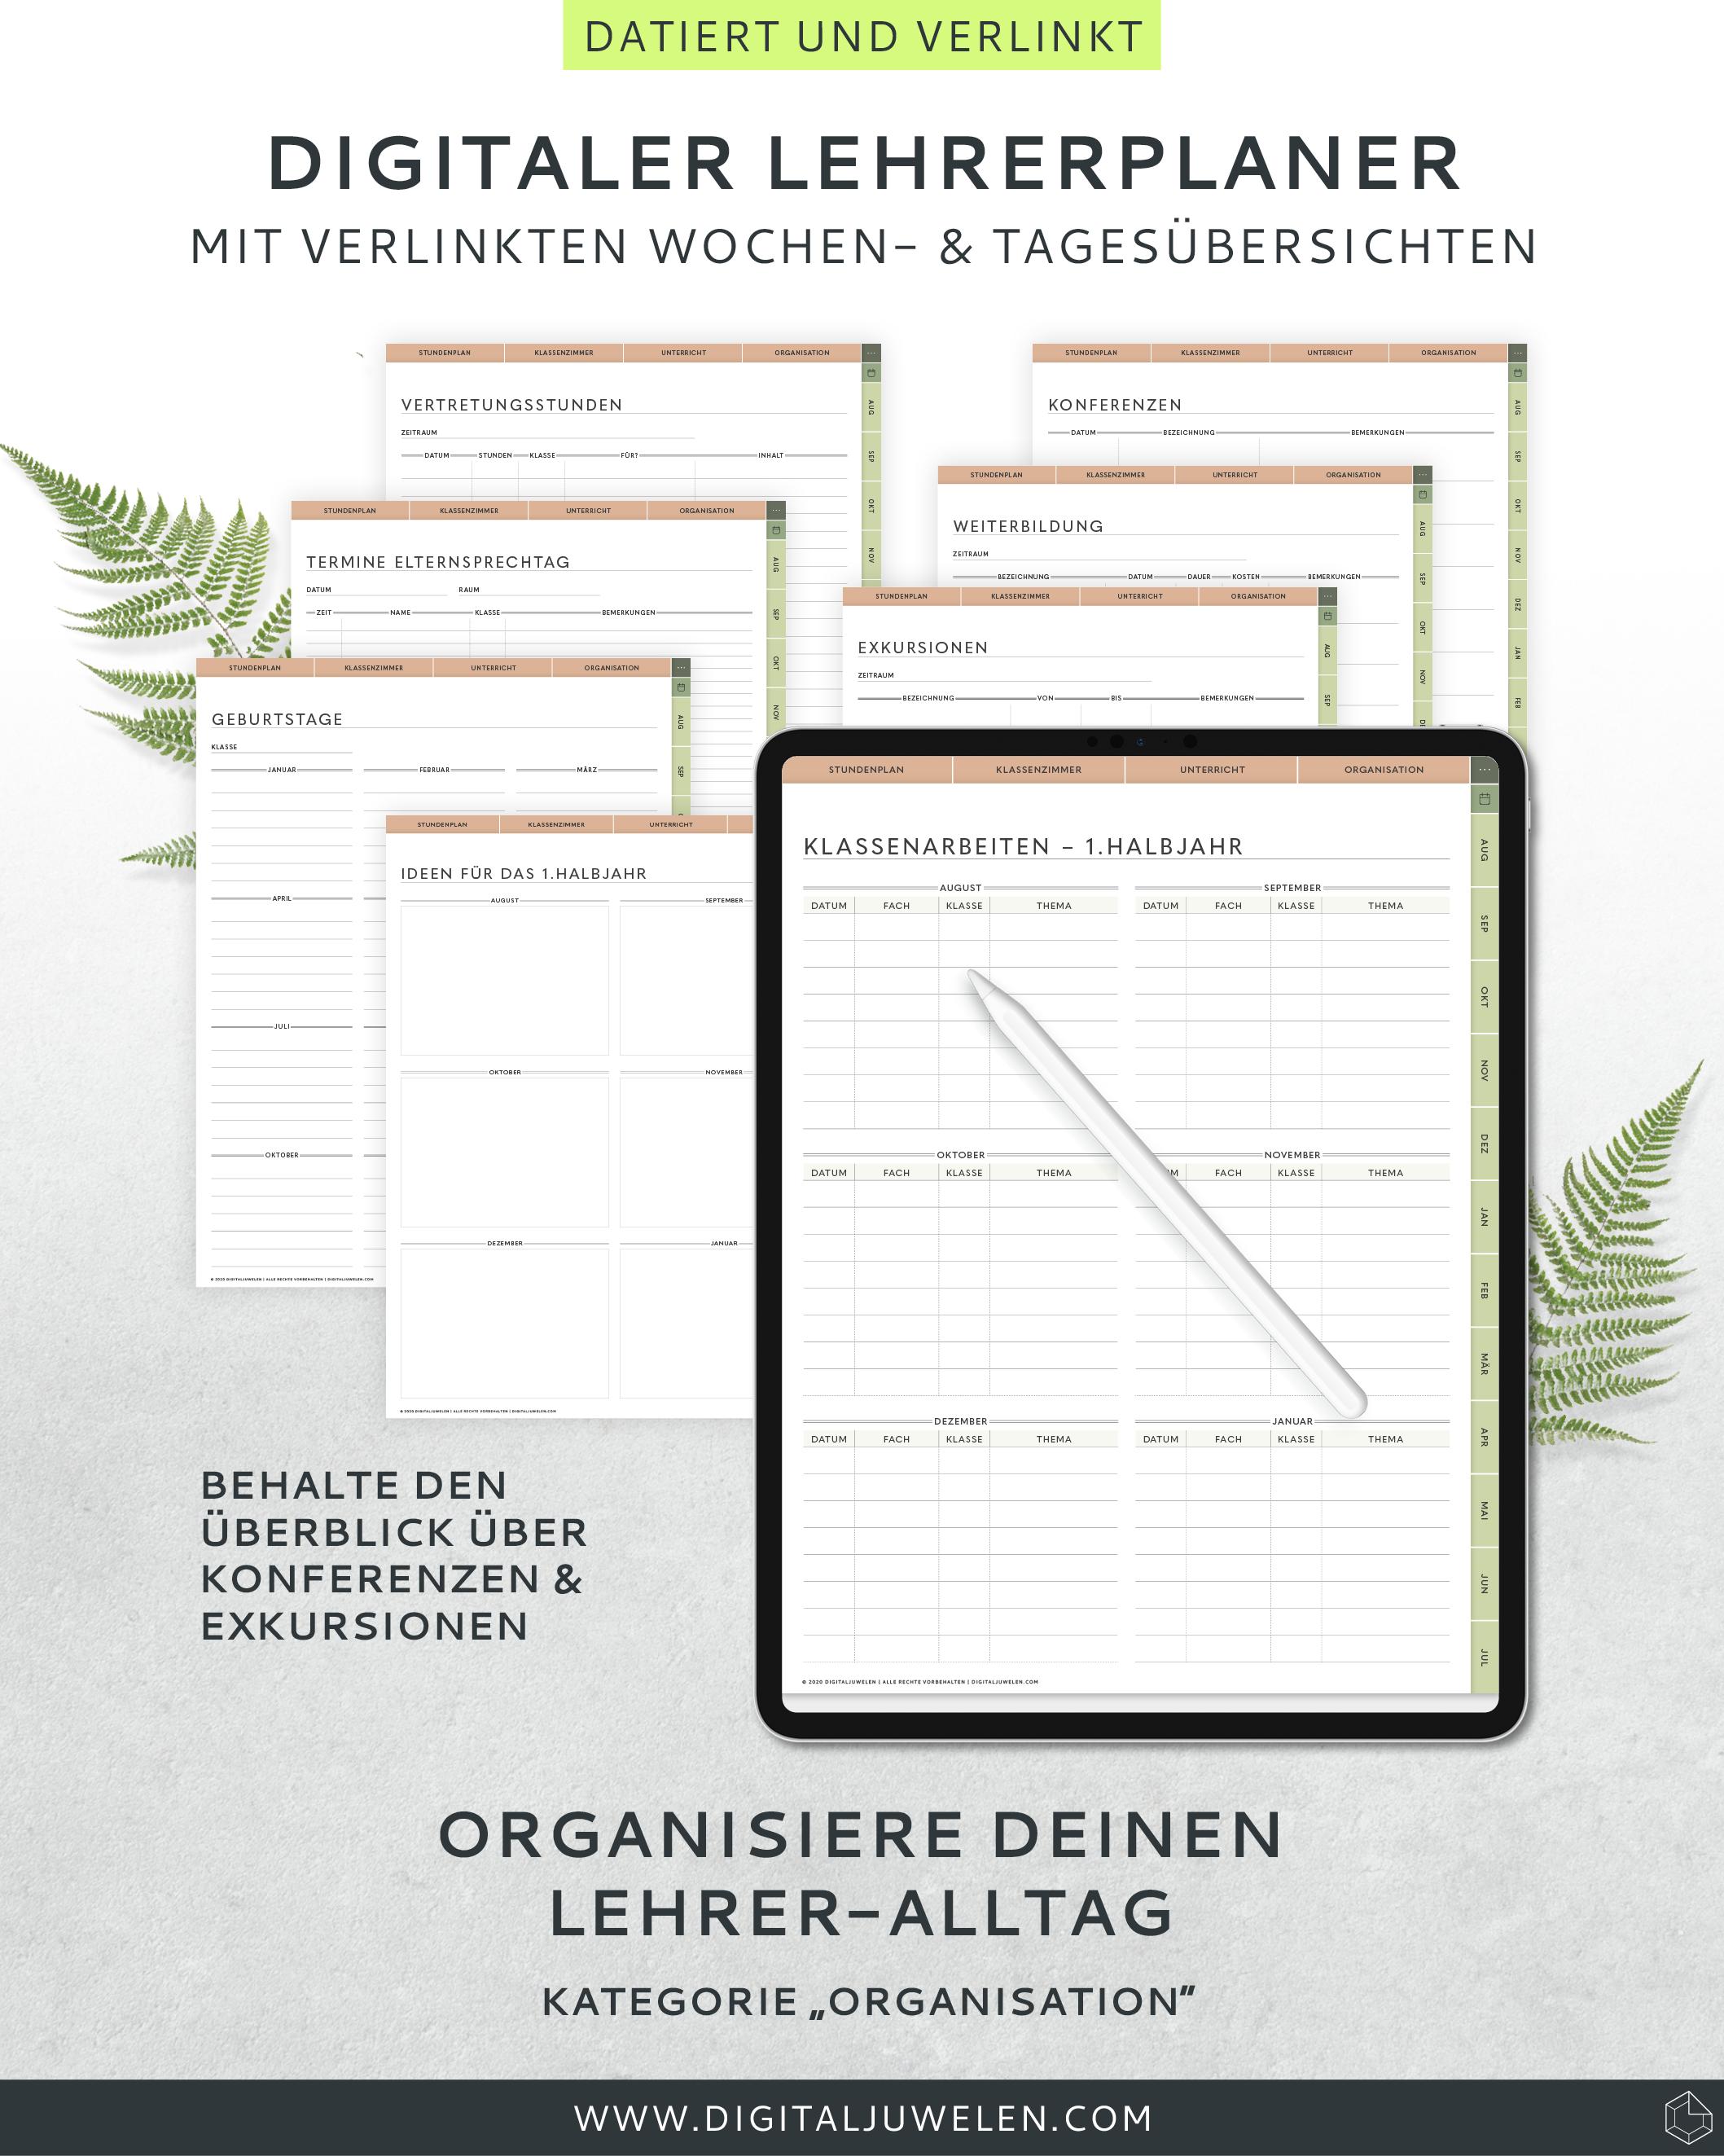 Digitaler Lehrerplaner Deutsch 2020 2021 Digitaler Lehrerkalender 2020 2021 In 2020 Bullet Journal Journal Notebook